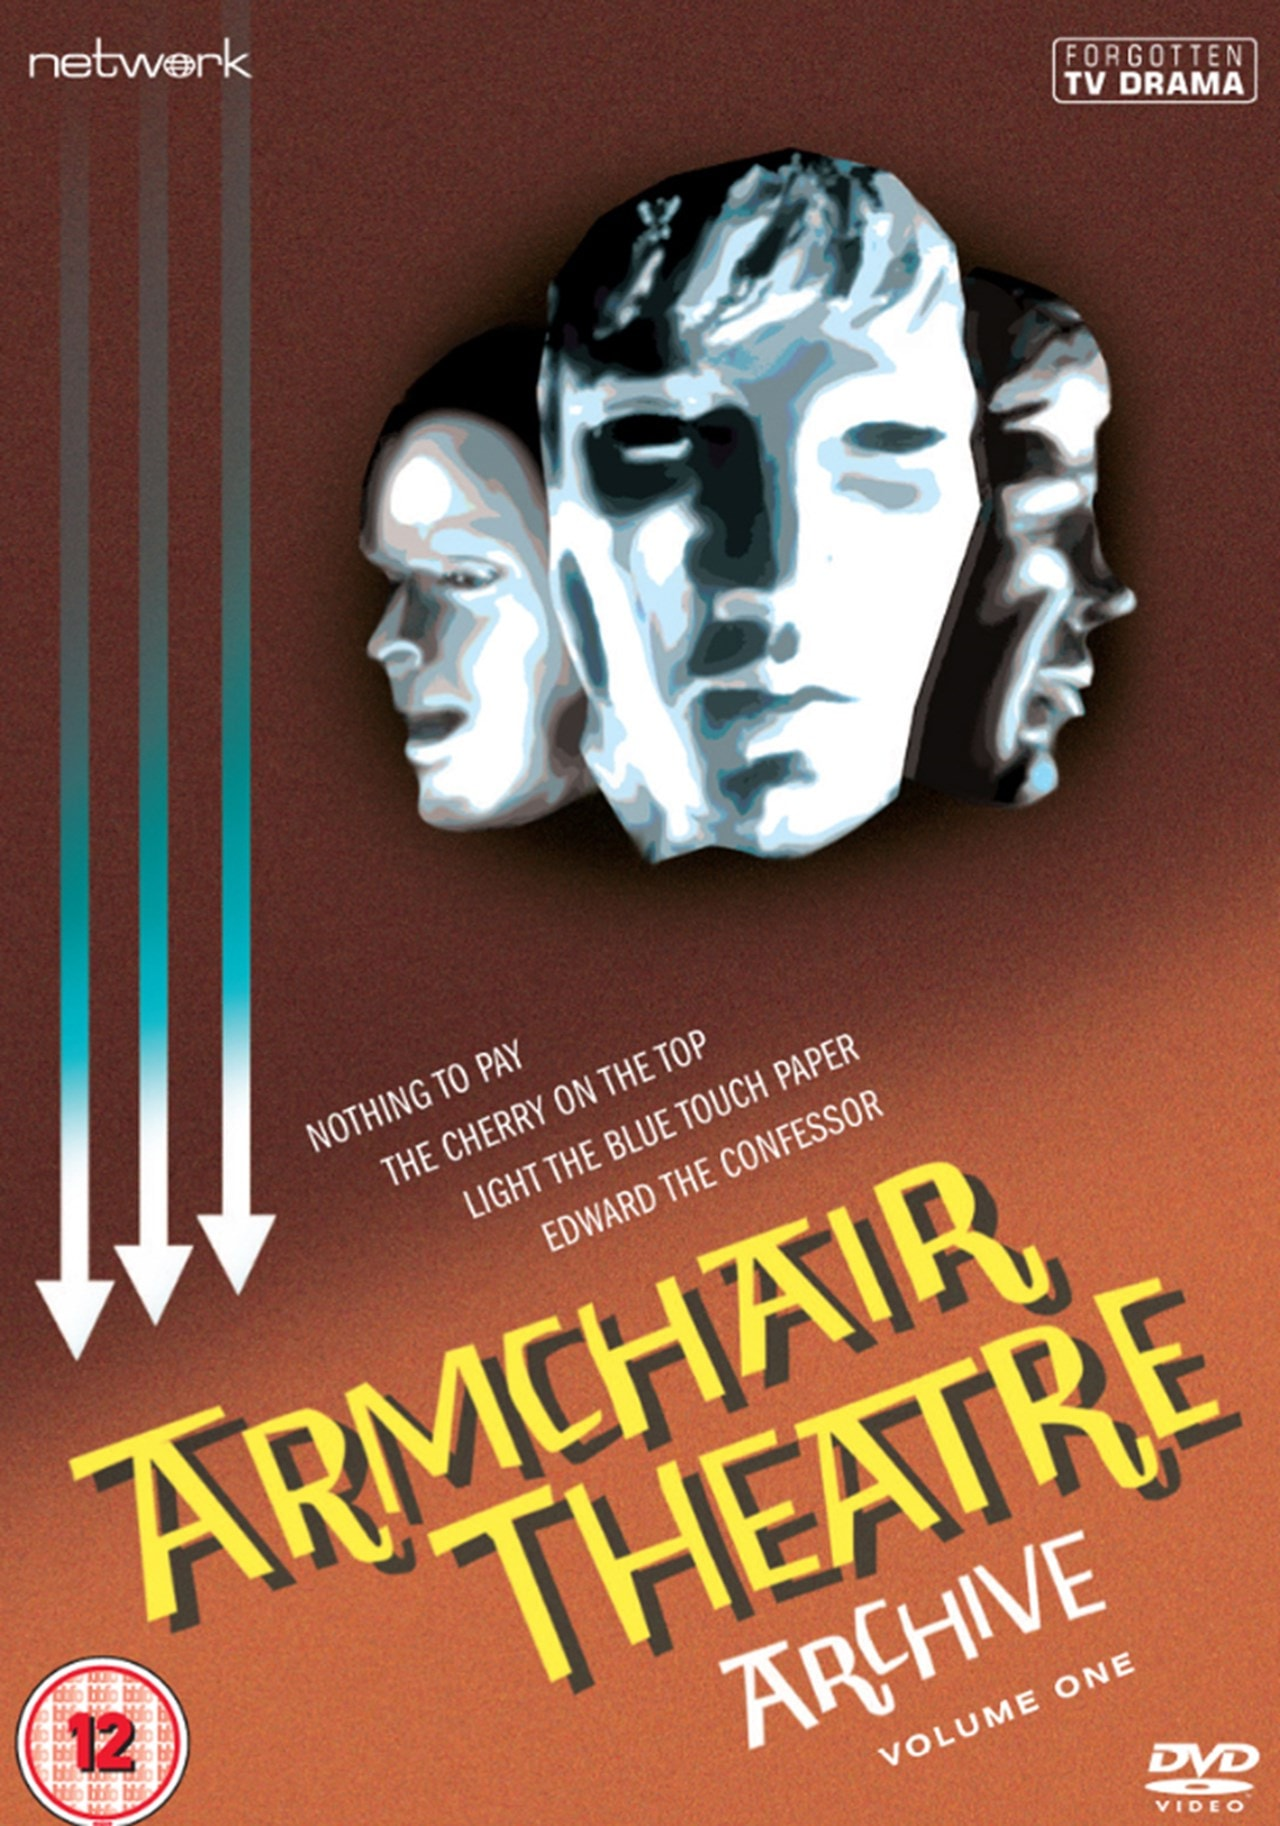 Armchair Theatre Archive: Volume 1 - 1